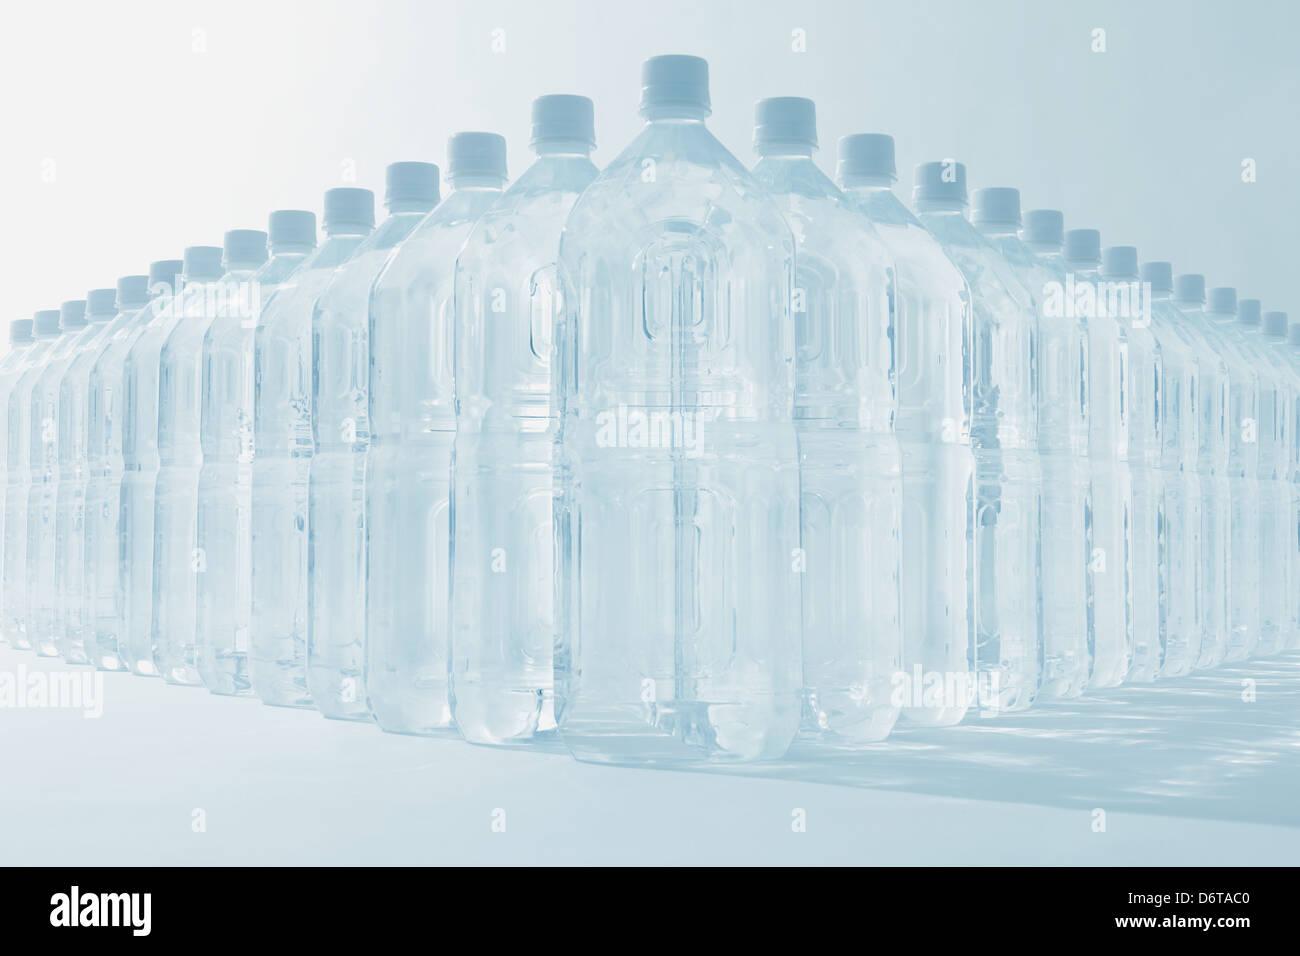 Agua embotellada Imagen De Stock